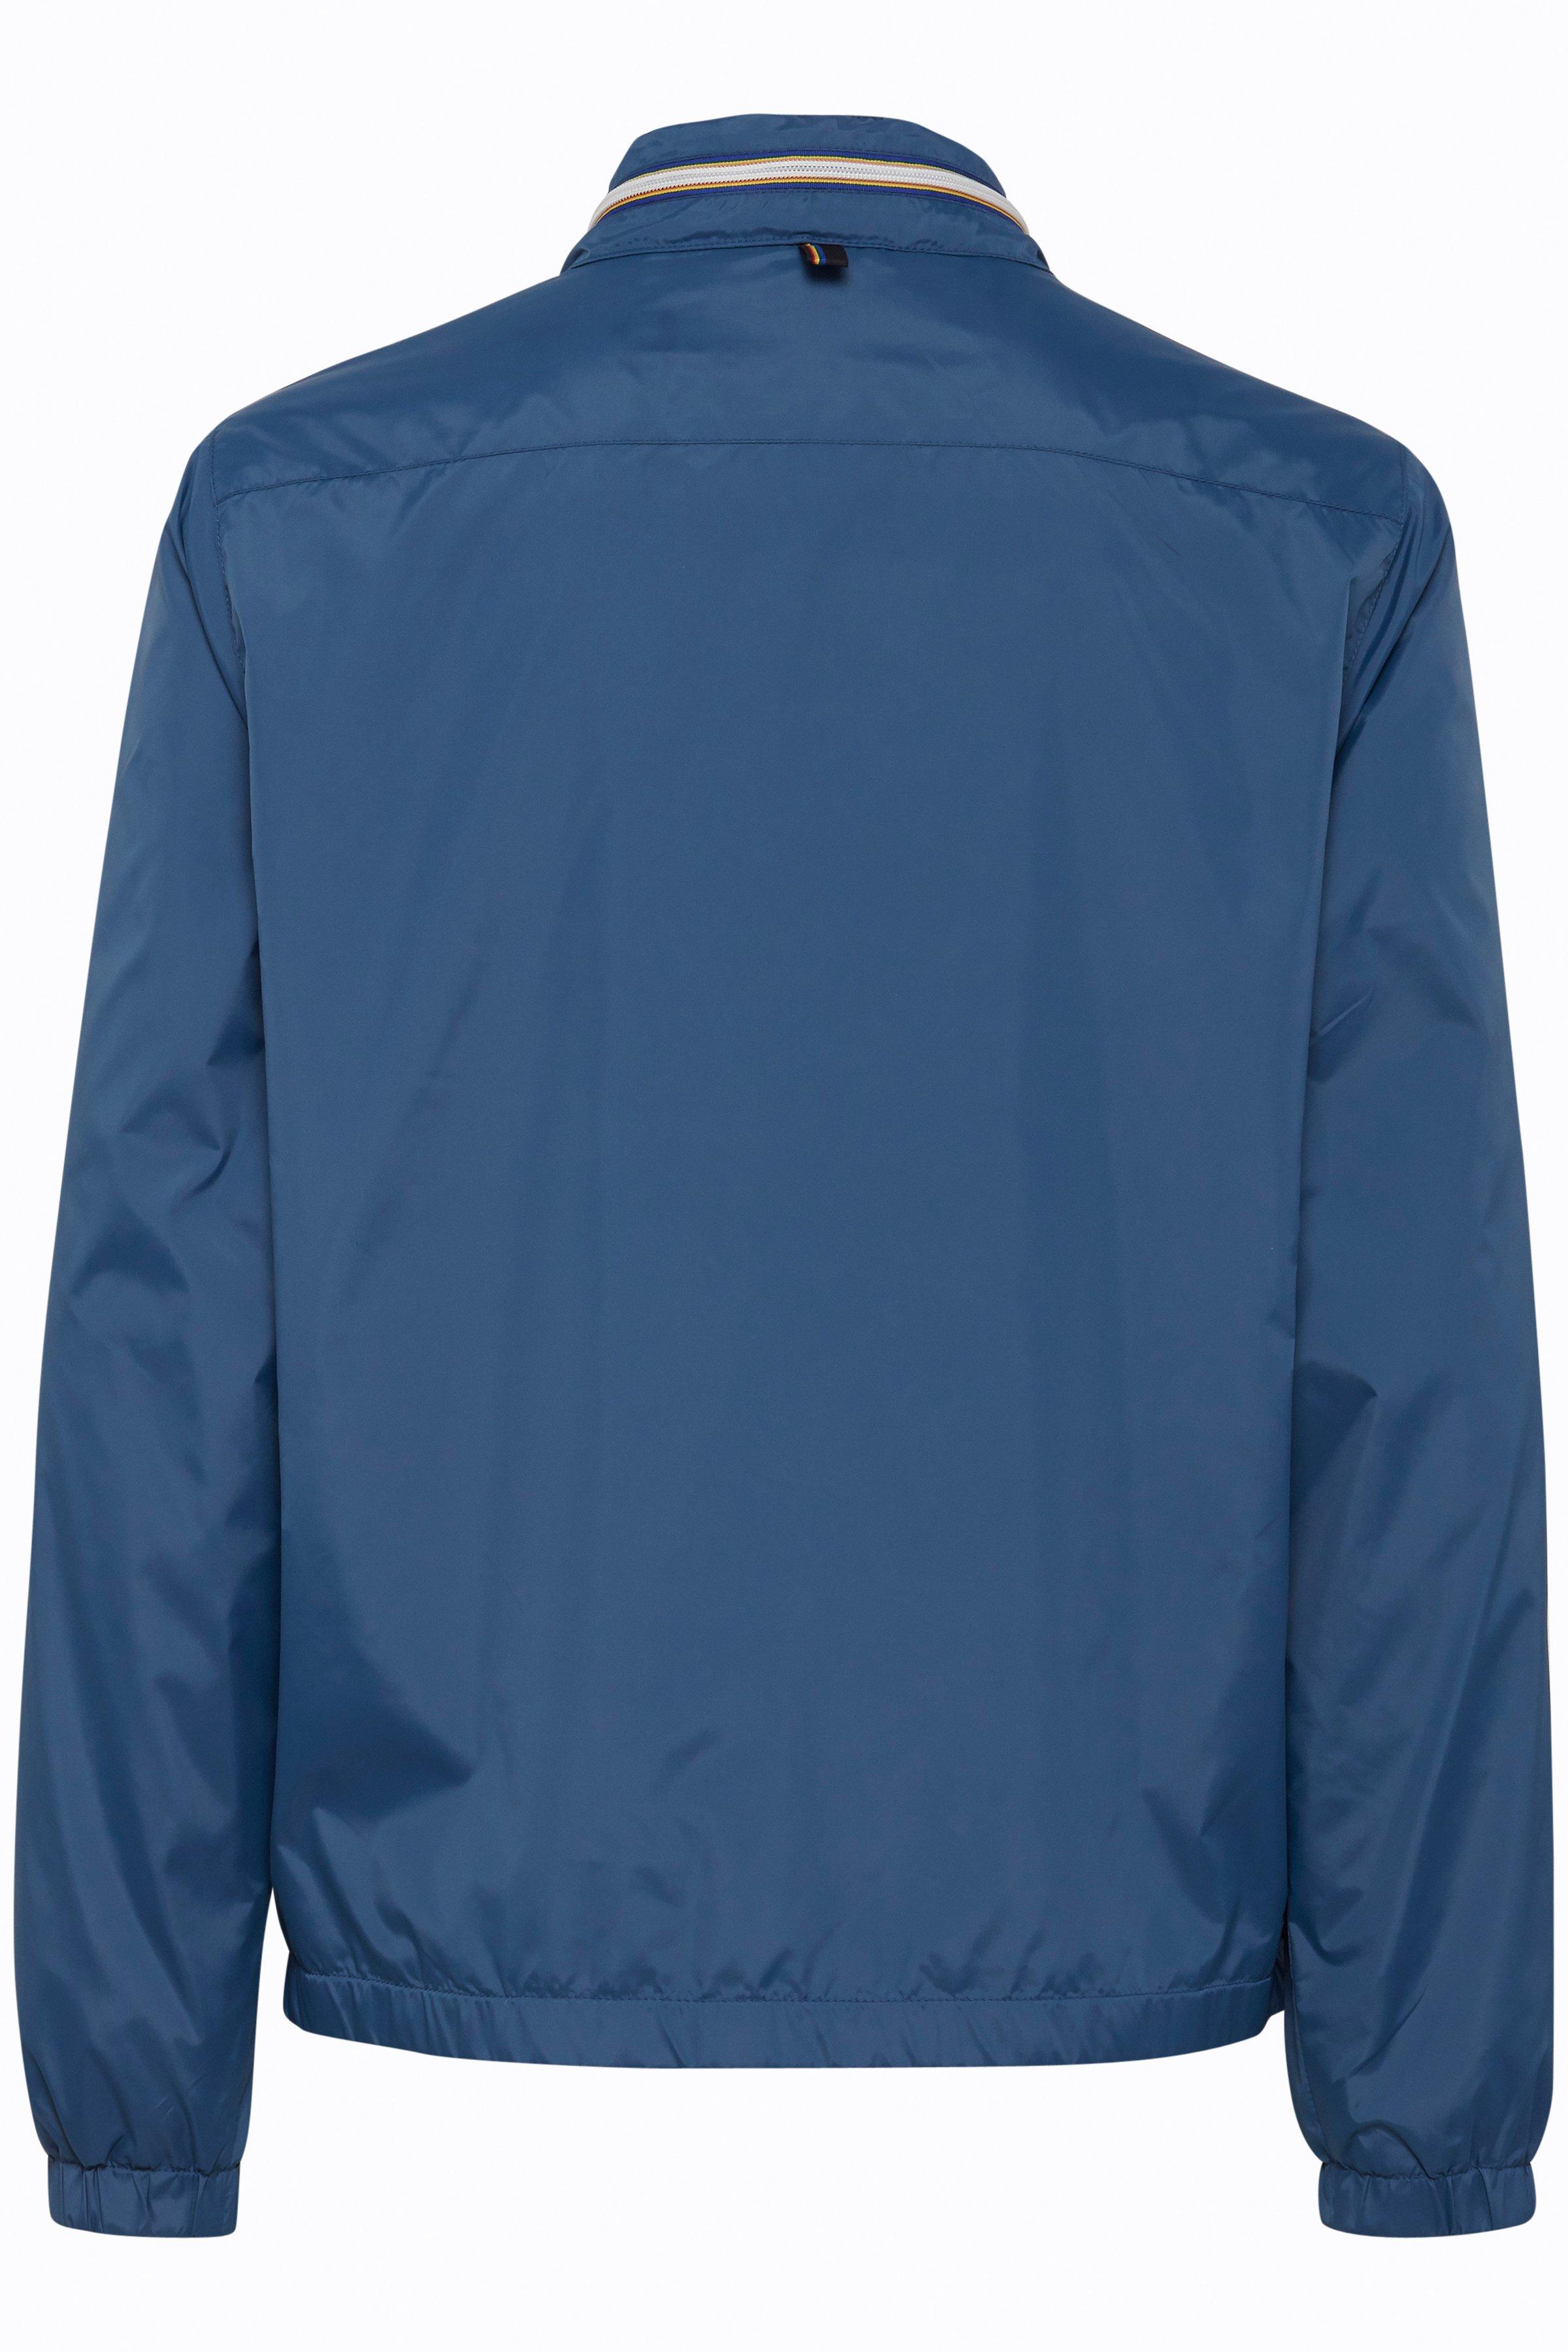 Denim Blue Jakke – Køb Denim Blue Jakke fra str. S-XXL her